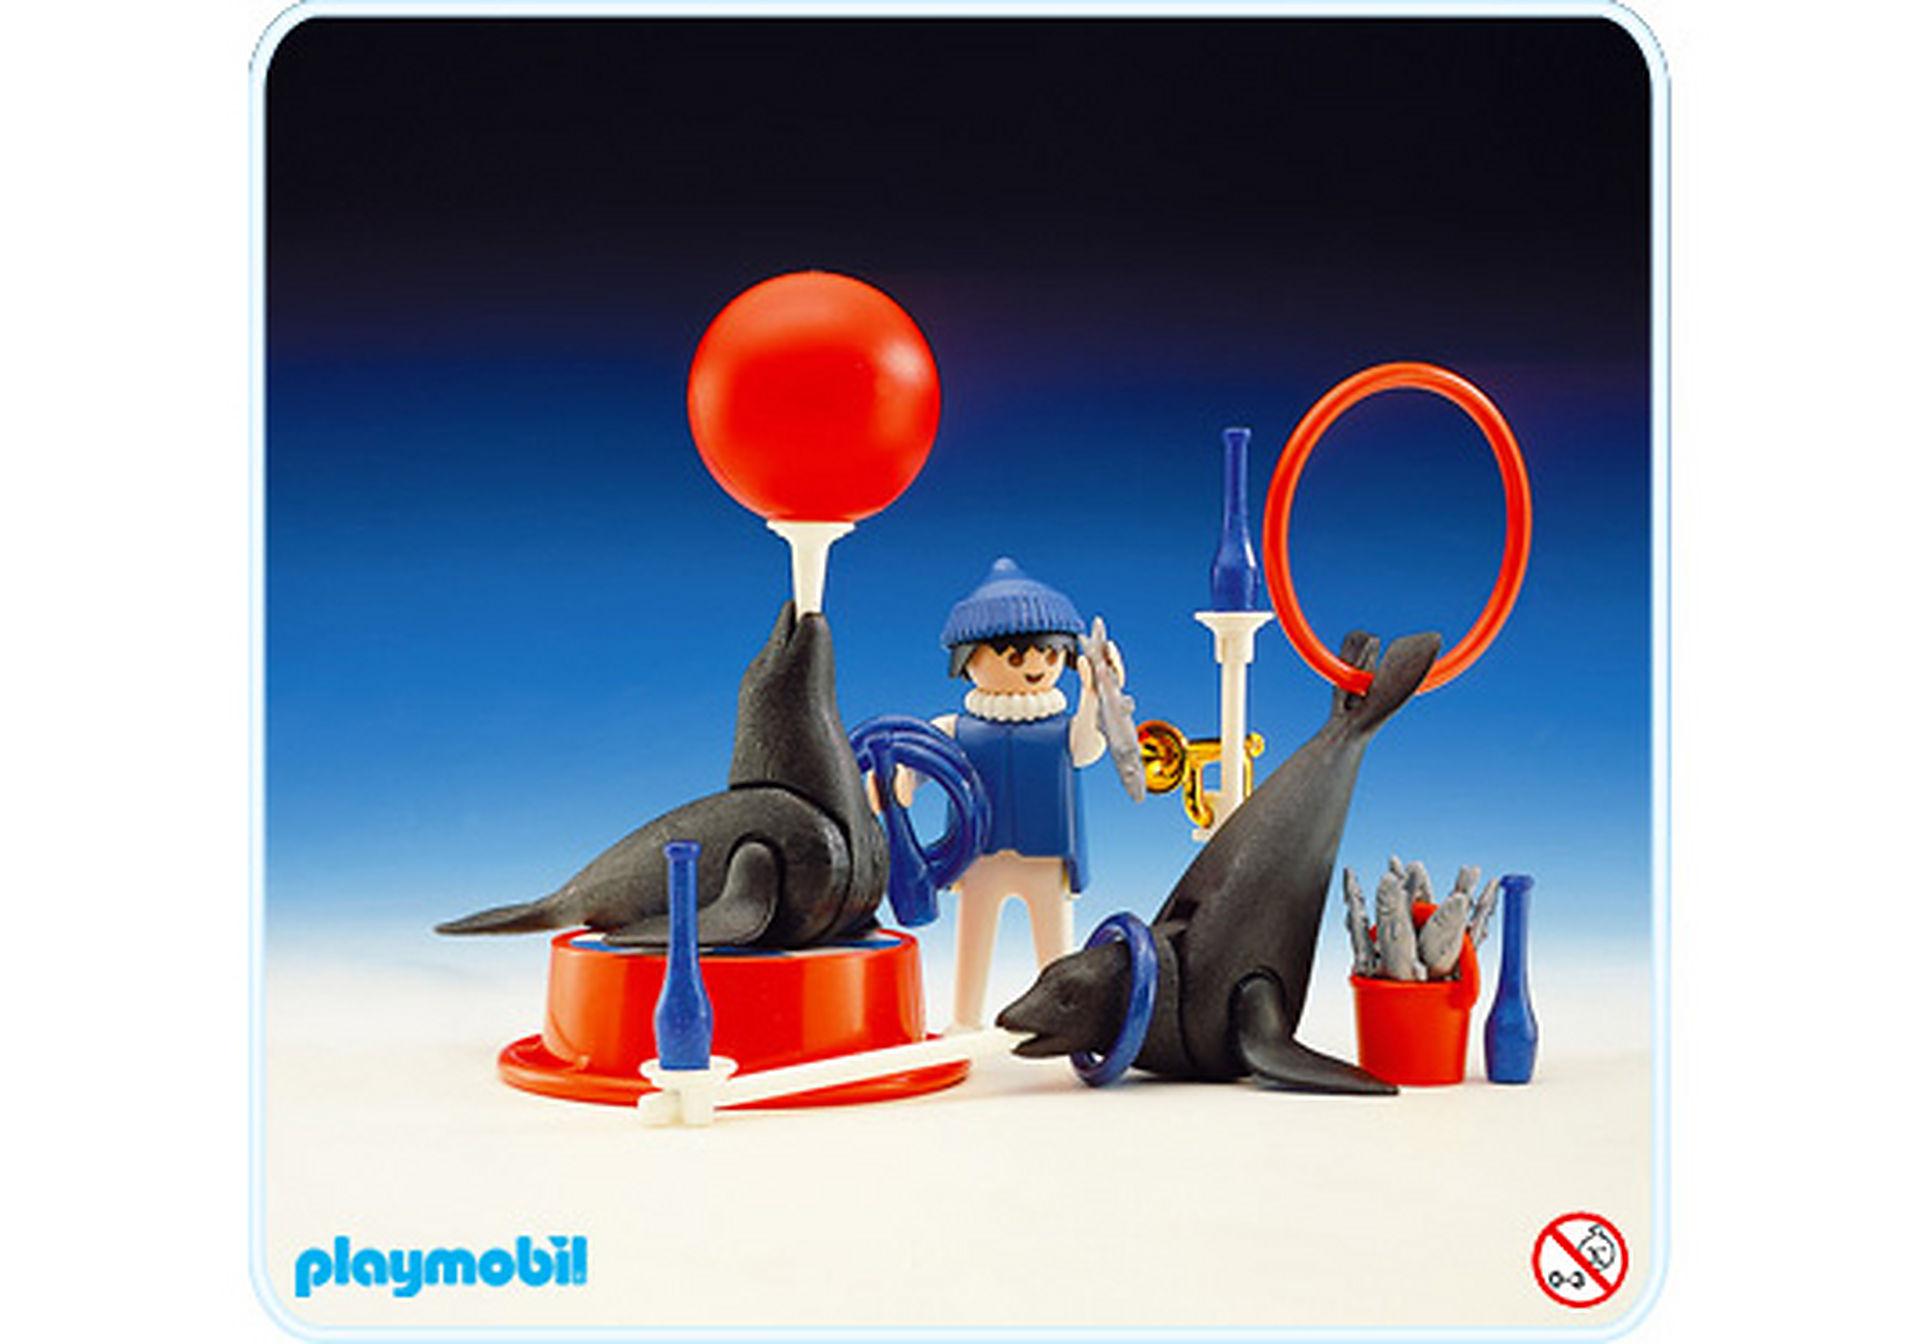 http://media.playmobil.com/i/playmobil/3518-B_product_detail/Dompteur/Seelöwen